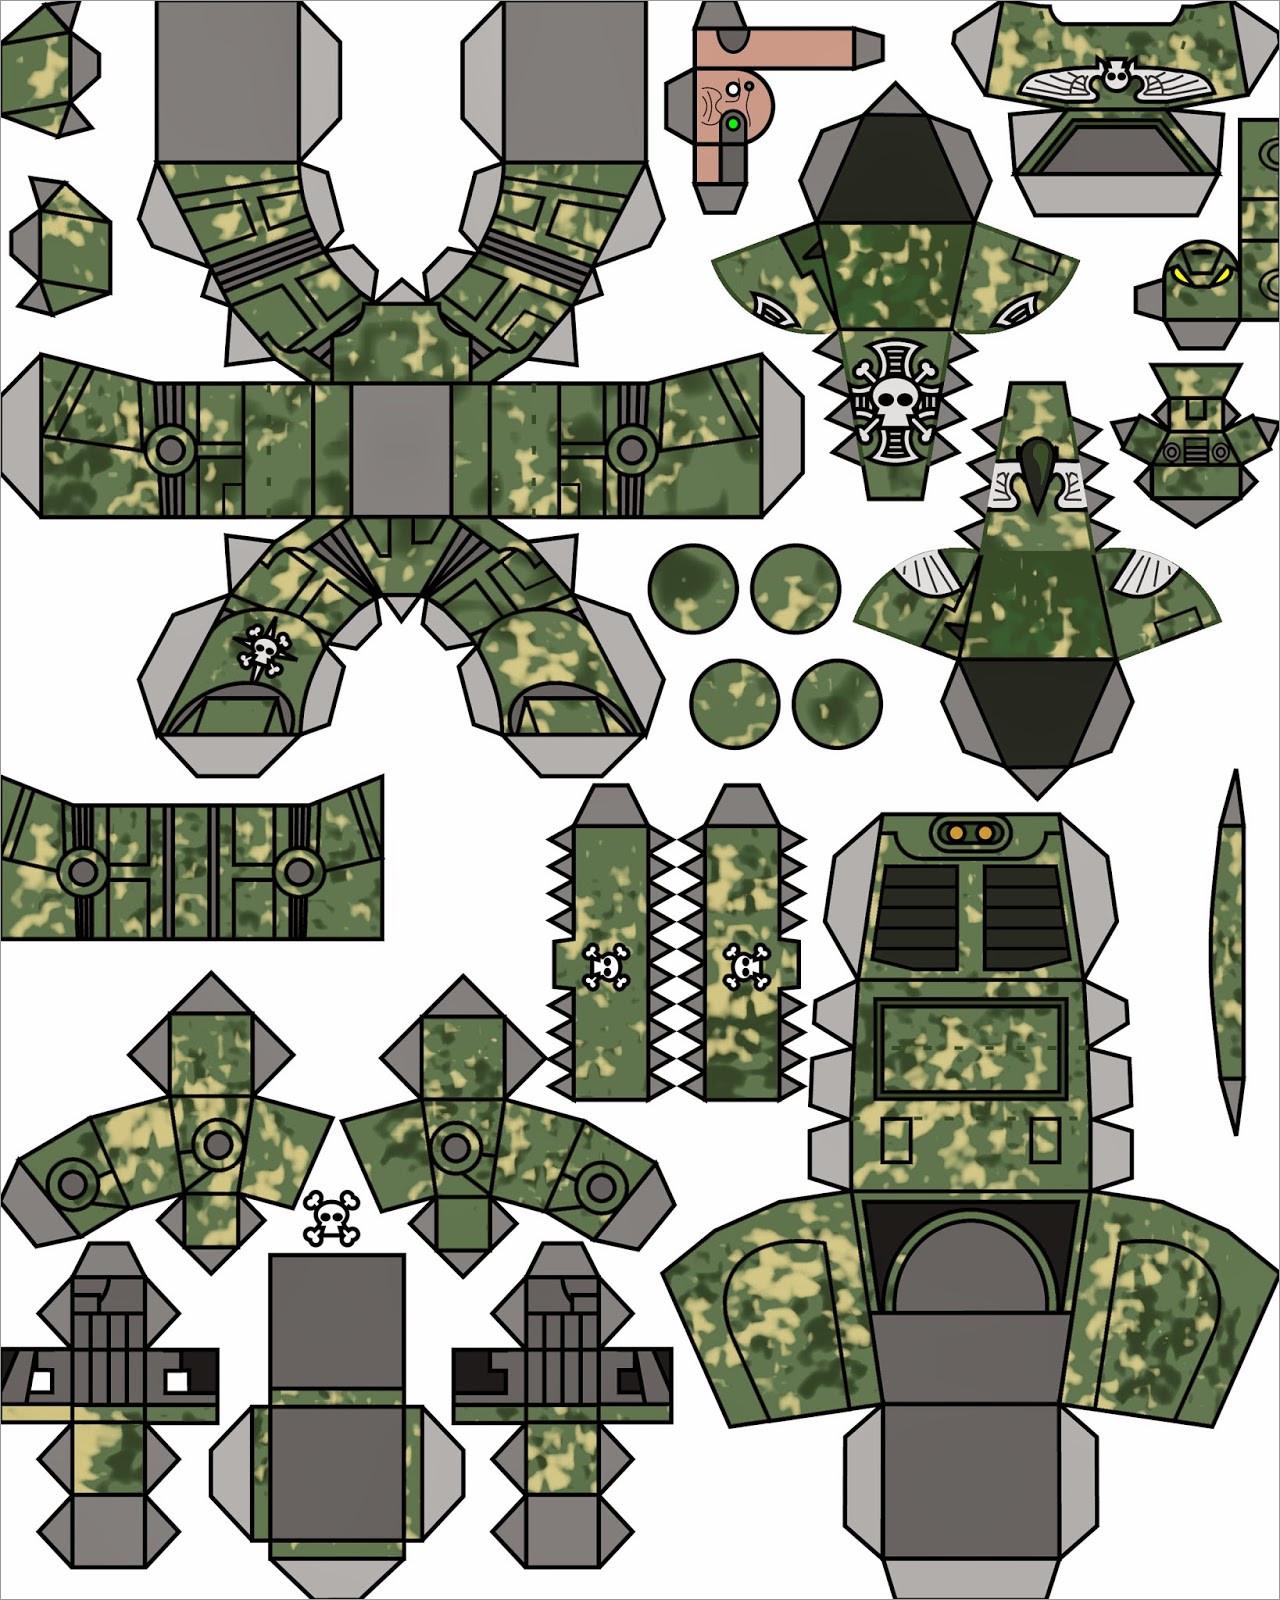 Warhammer 40k Papercraft Warhammer 40k Papercraft Download